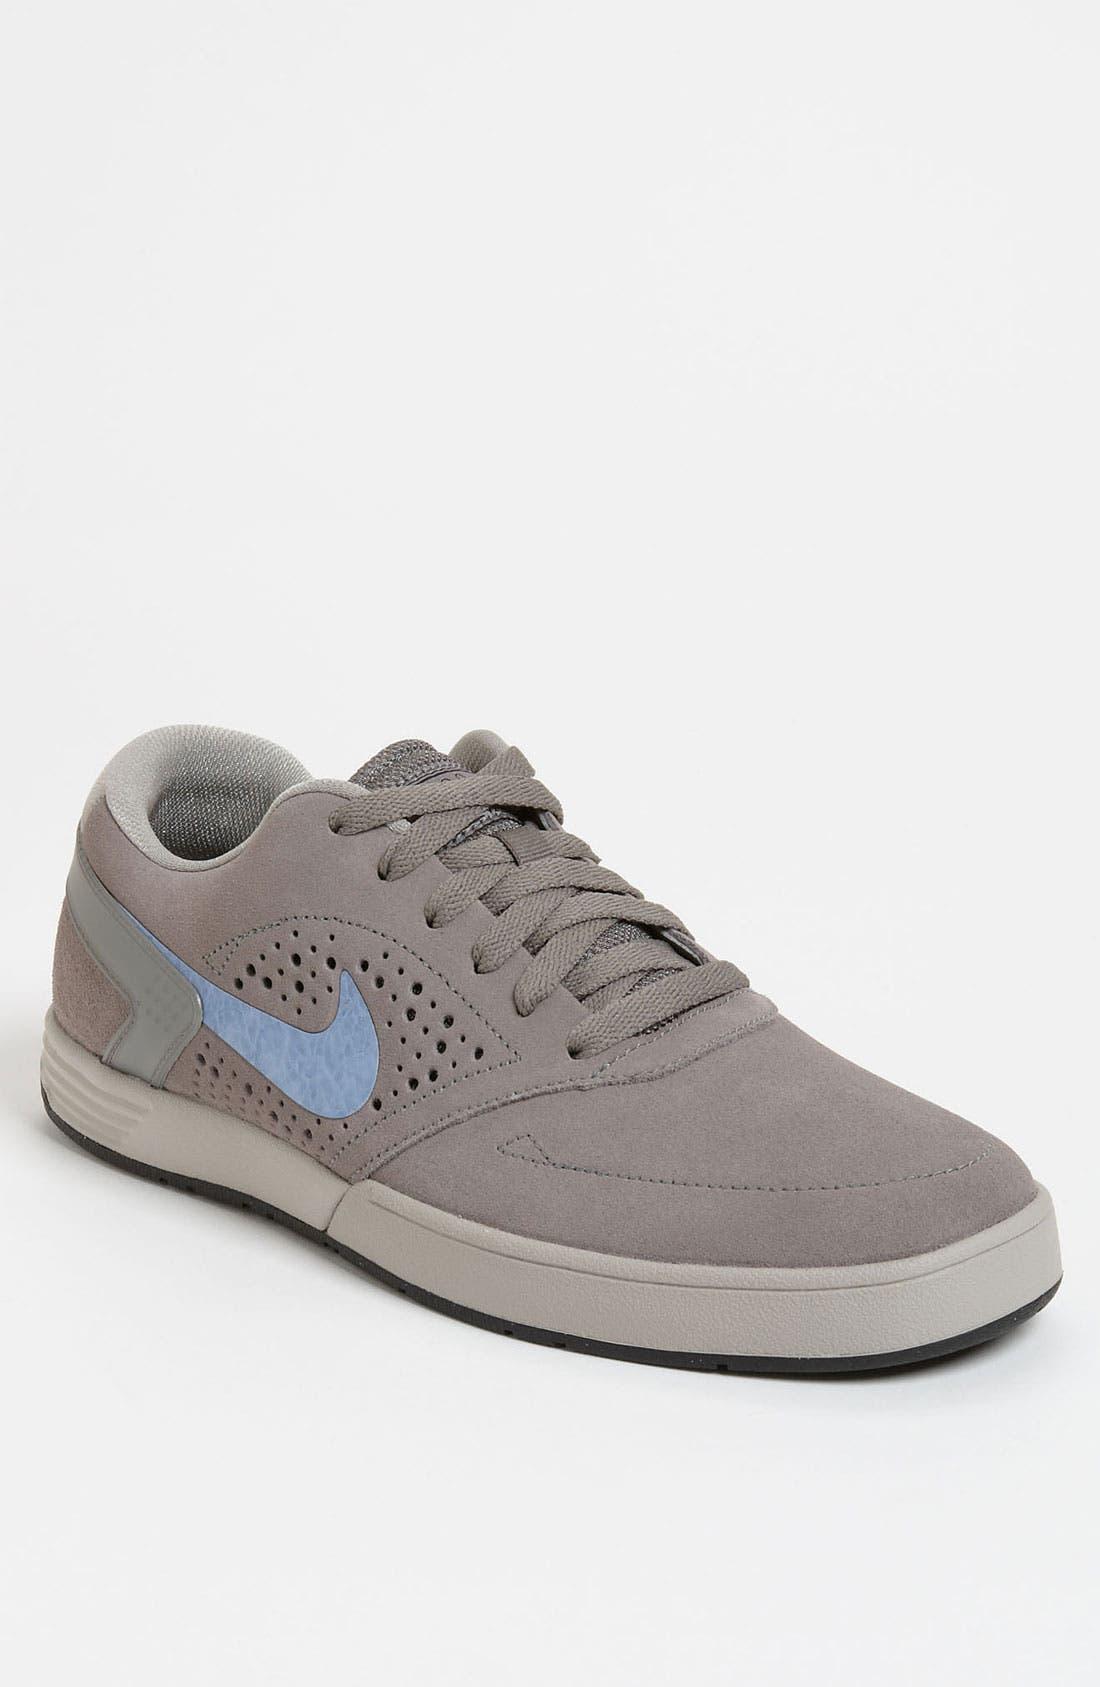 Main Image - Nike 'Paul Rodriguez 6' Sneaker (Men) (Online Only)